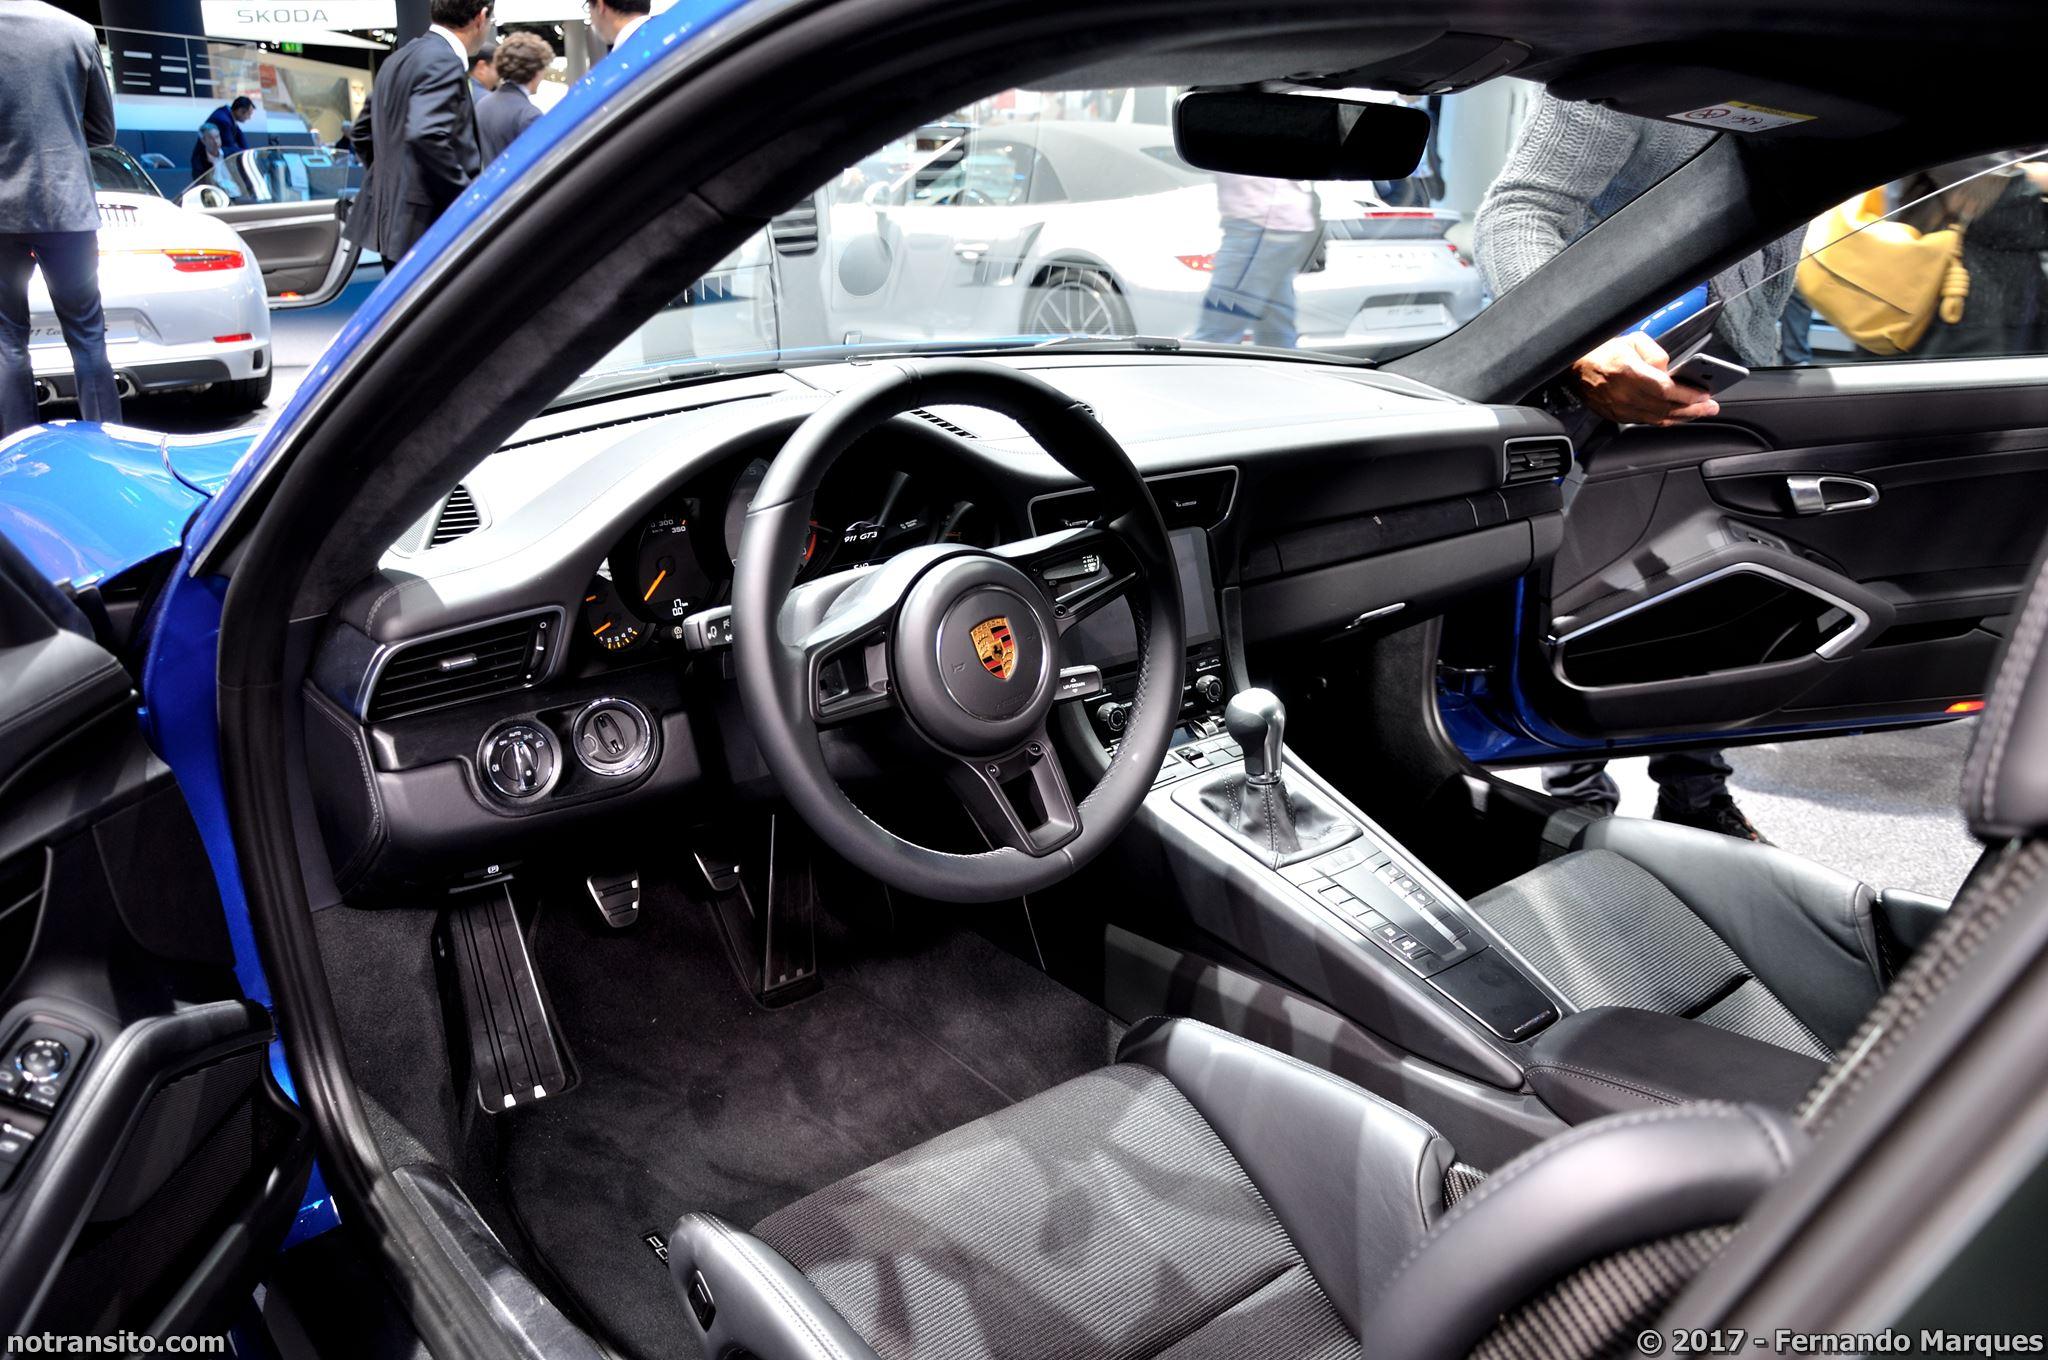 Porsche-911-GT3-Touring-Package-Frankfurt-2017-011